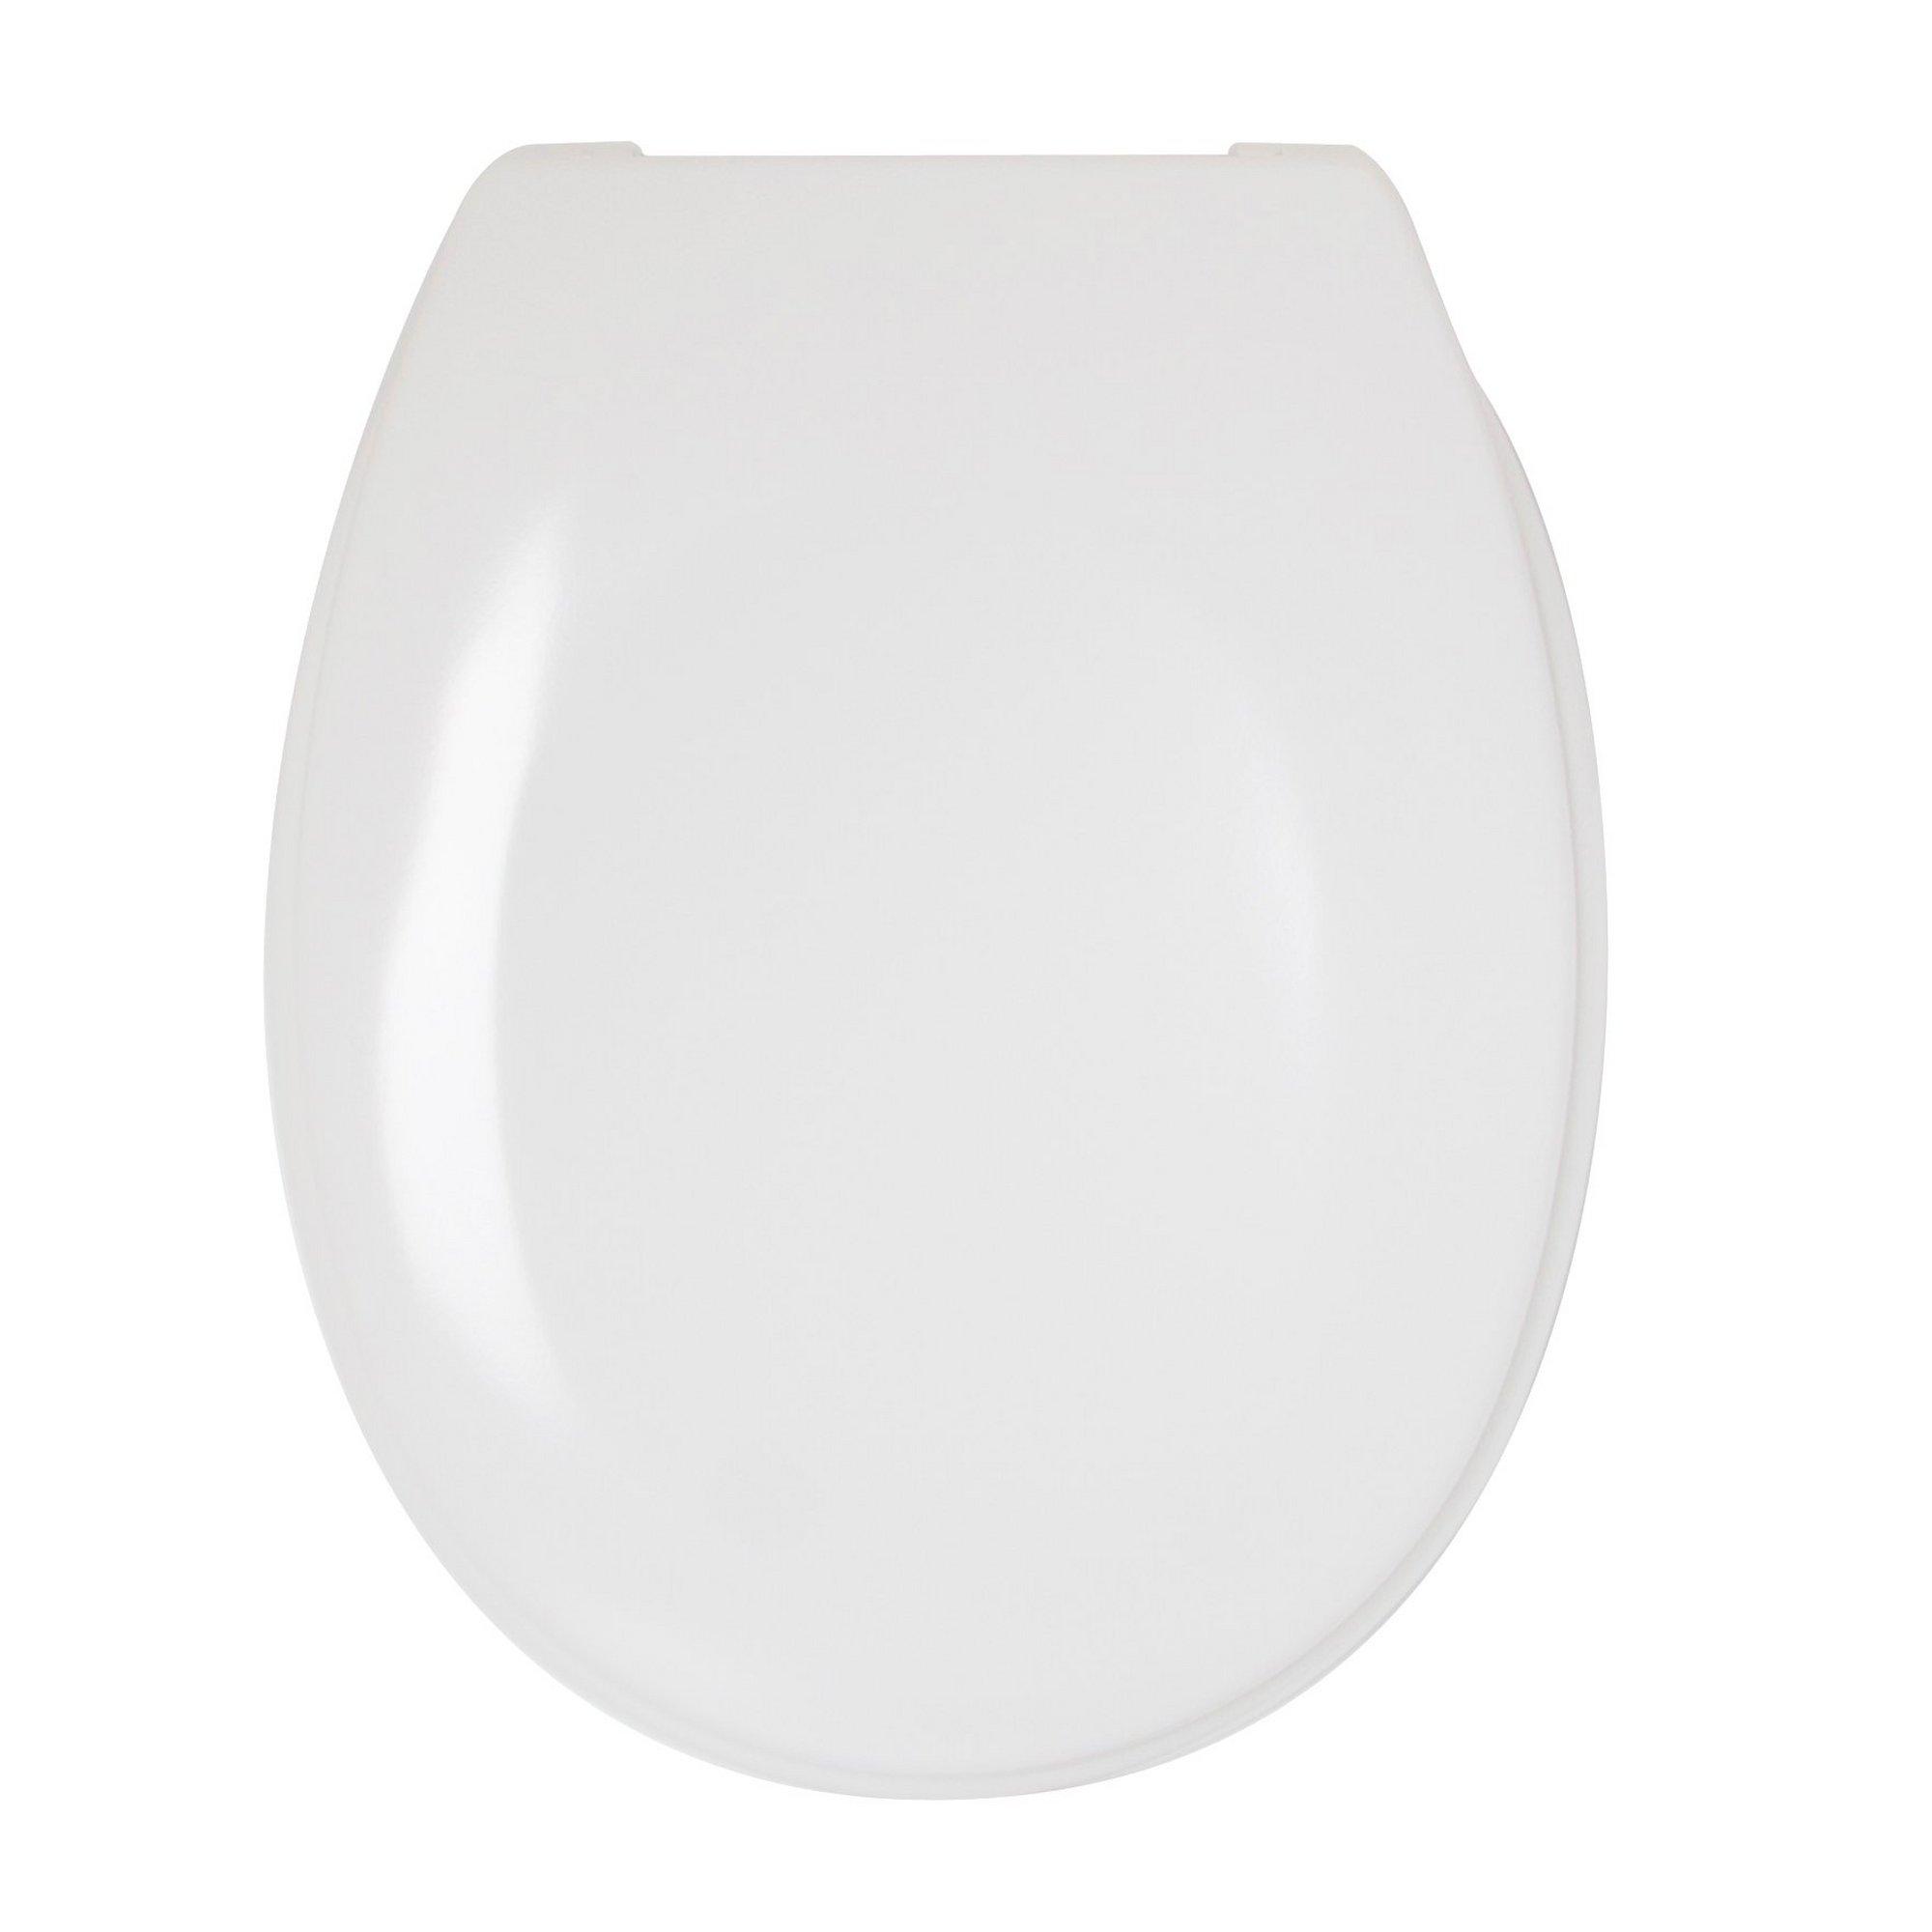 Image of Slow Close Toilet Seat